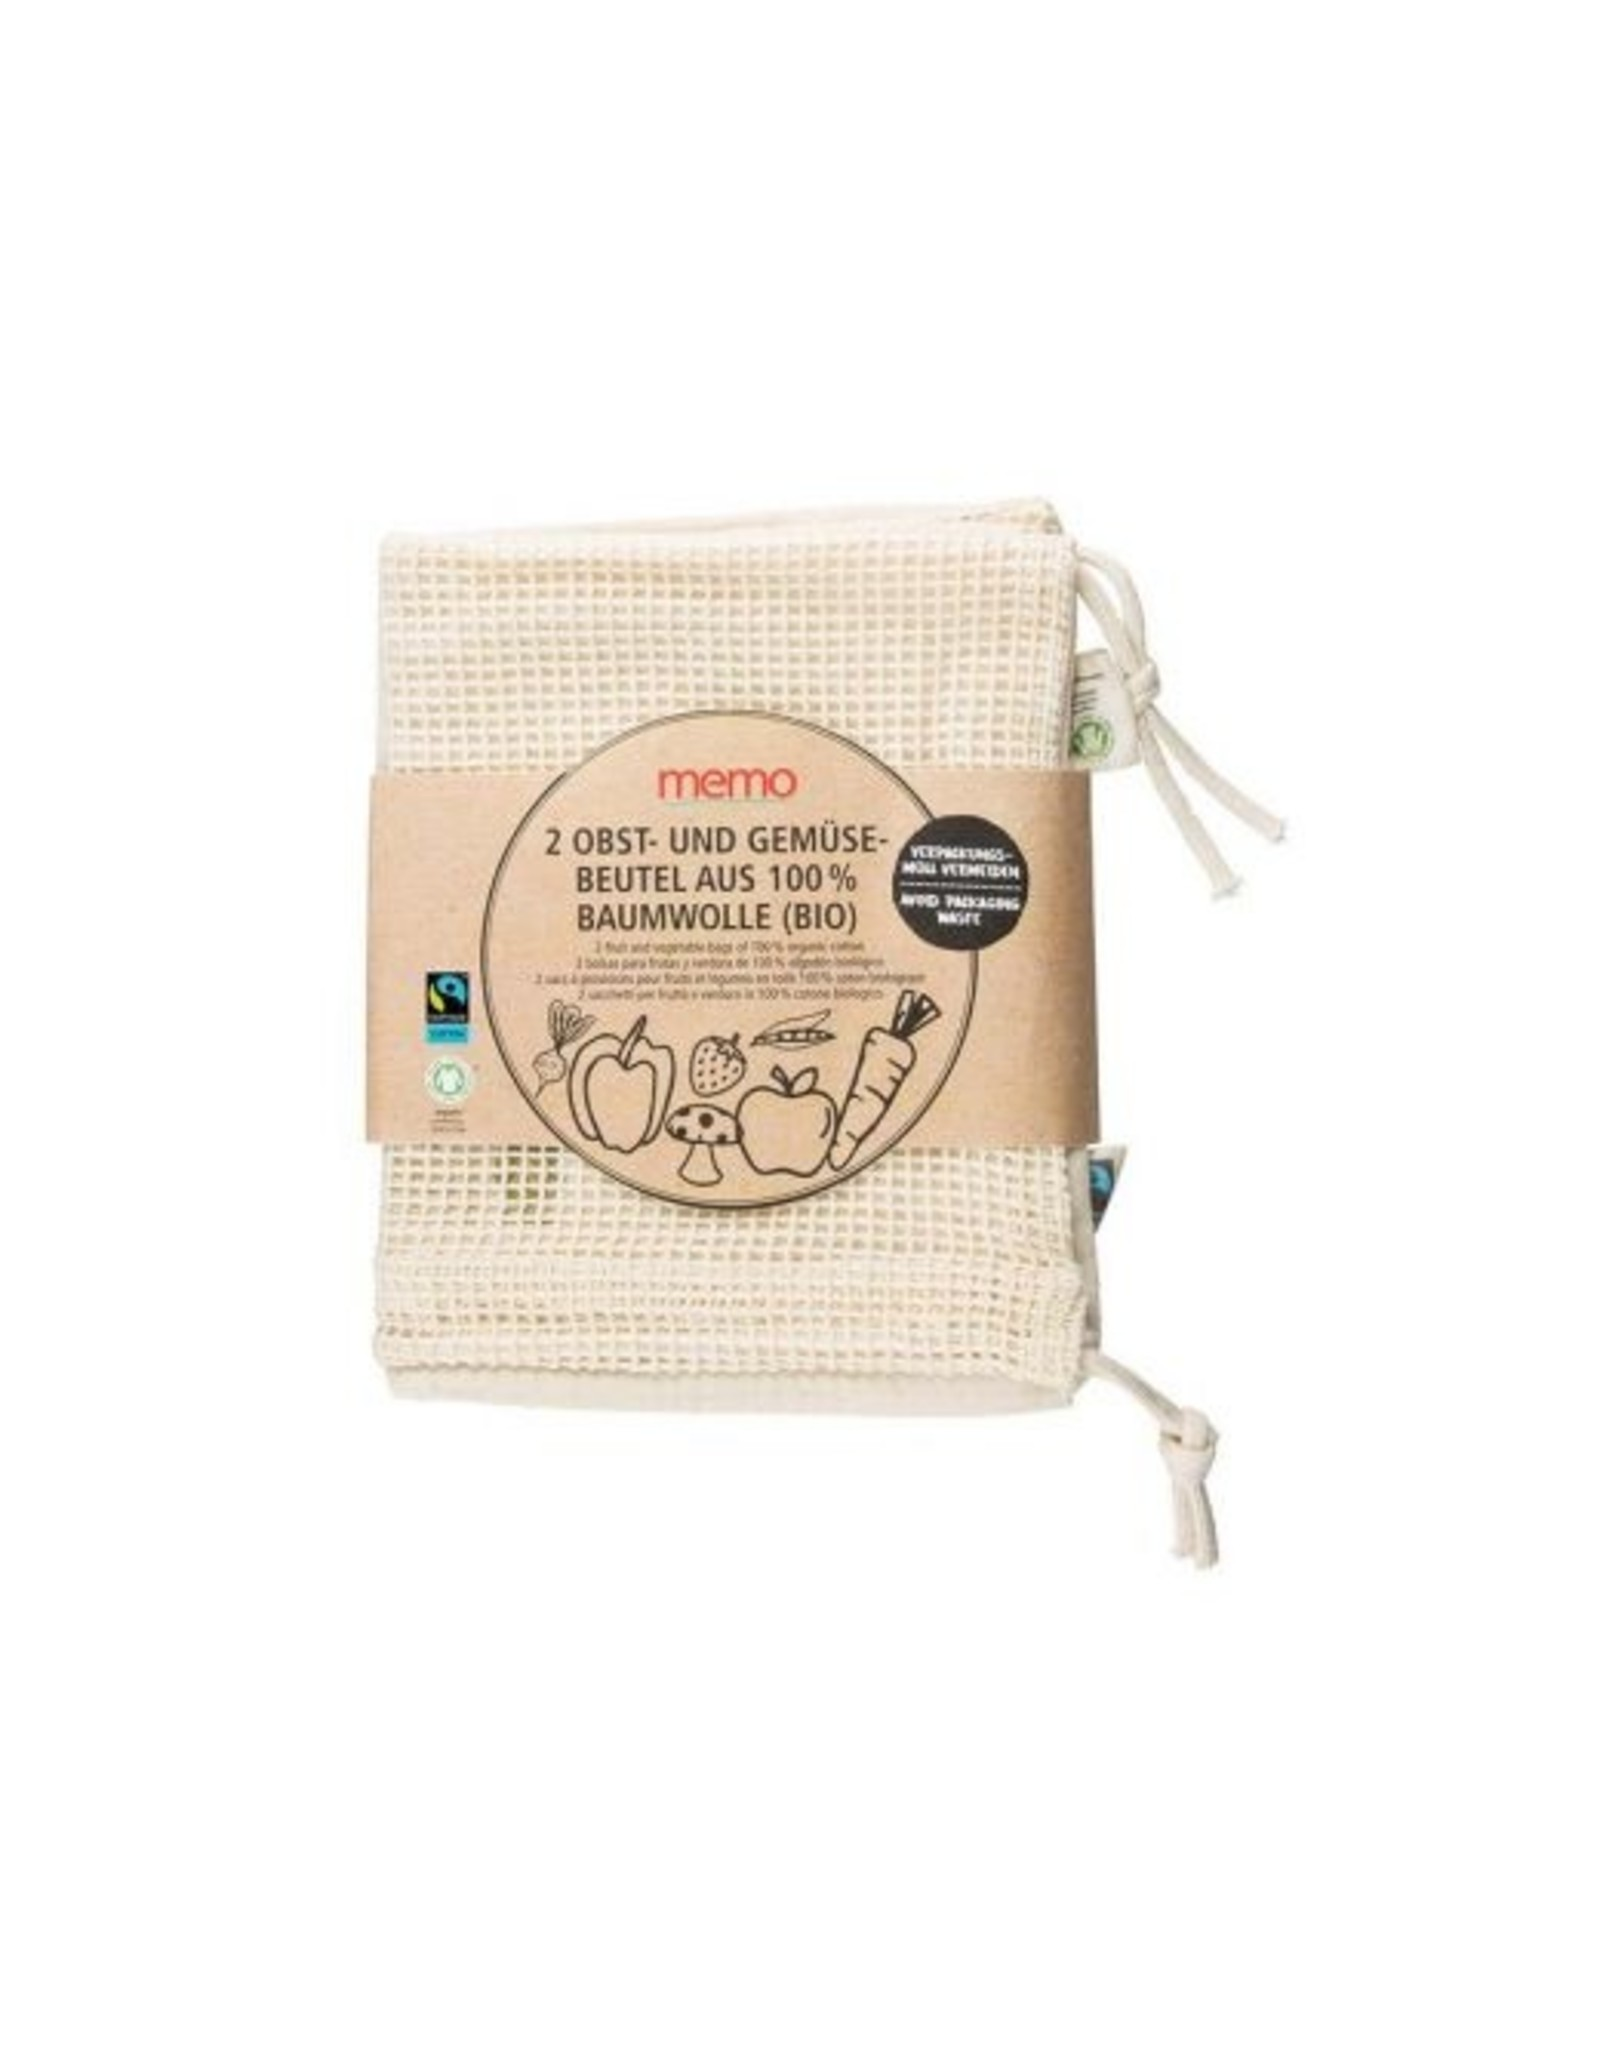 memo Obst & Gemüse Baumwoll-Beutel 2er Pack 1Stk